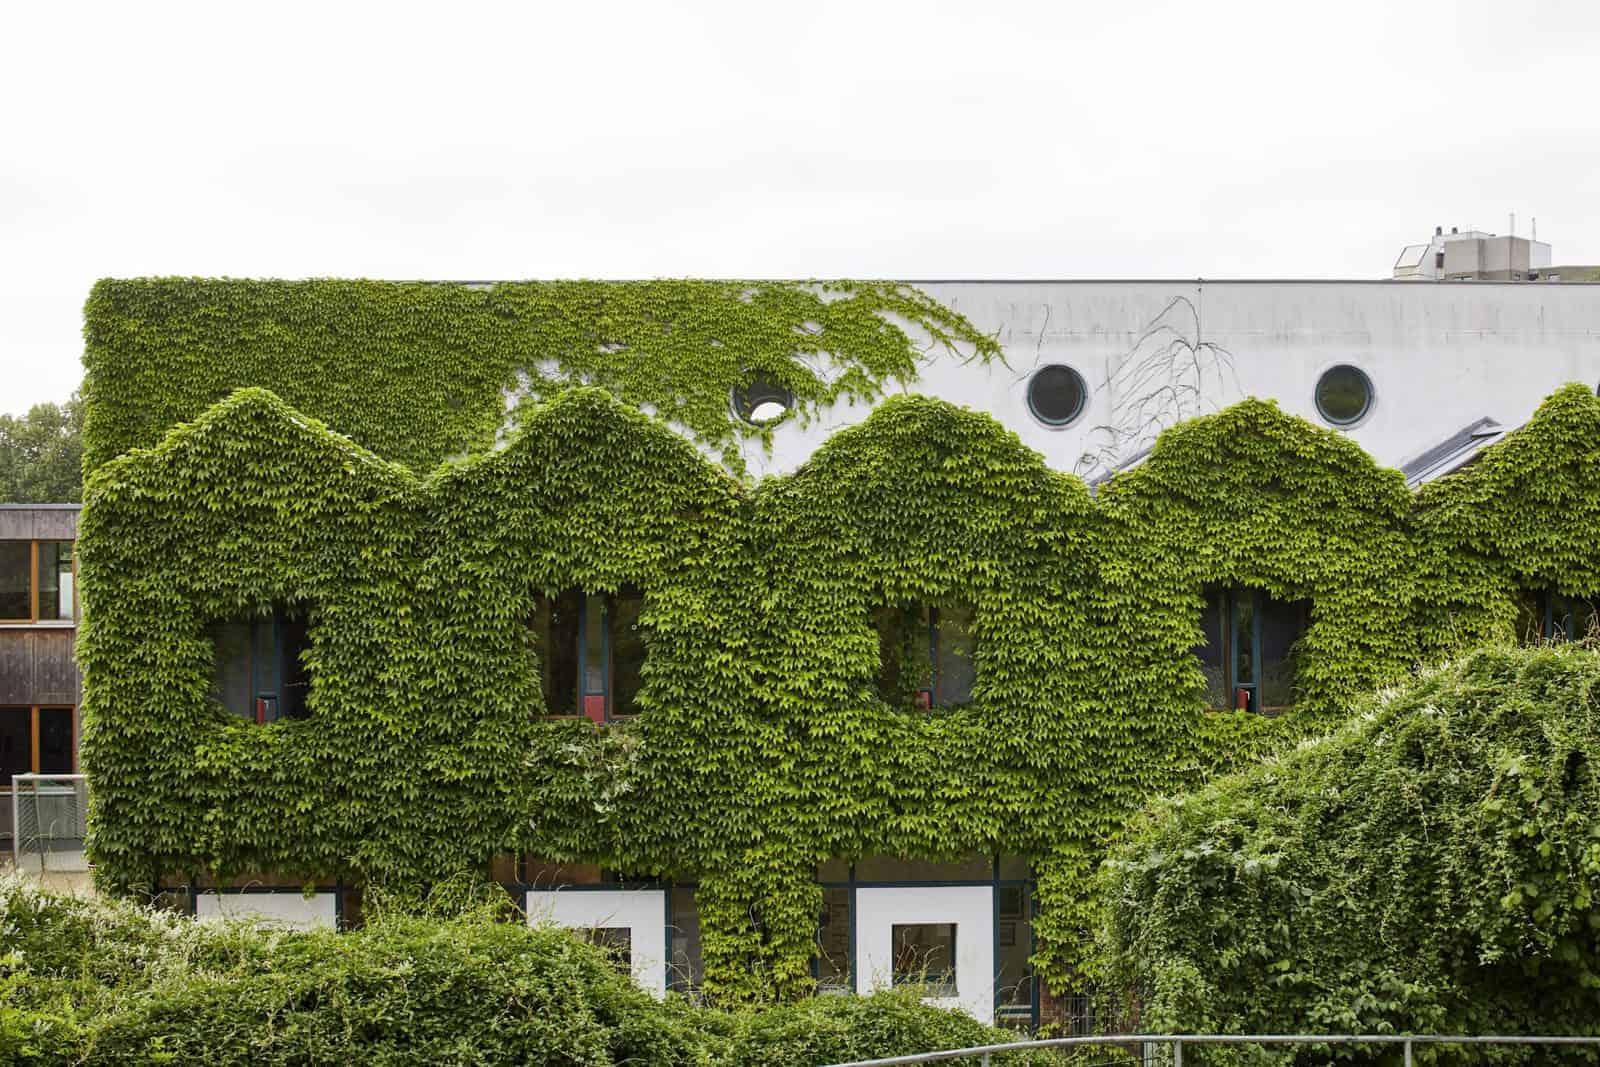 Kindertagesstätte Sossenheim, Christoph Mäckler Architekten